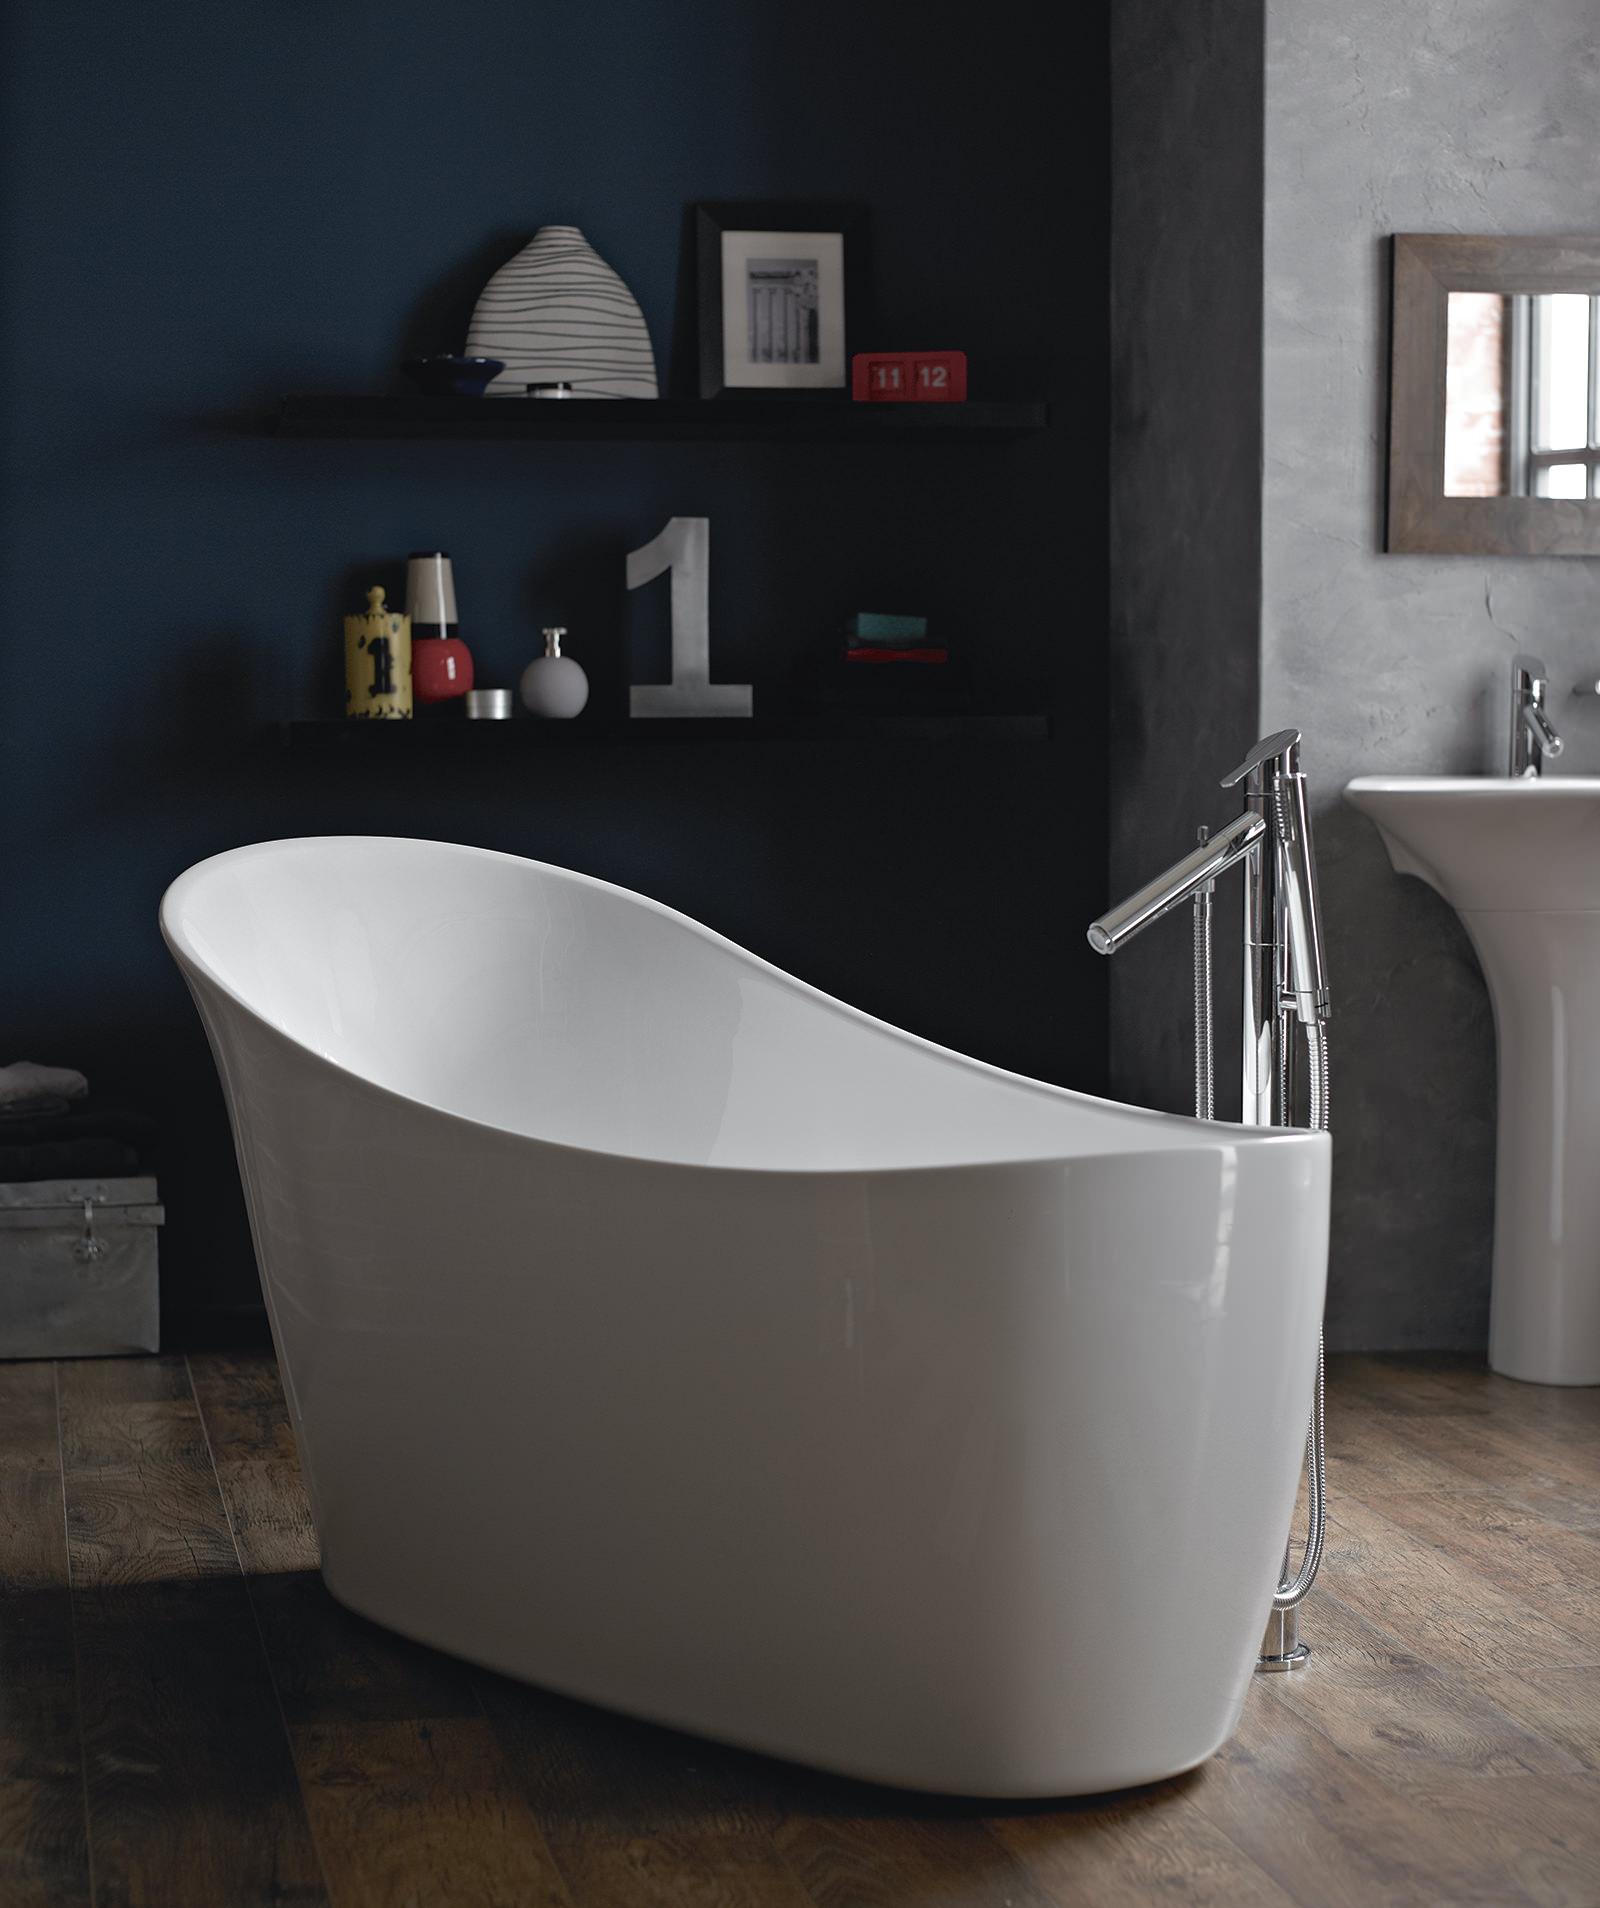 Heritage Polperro Freestanding Slipper Bath 1590 x 680mm